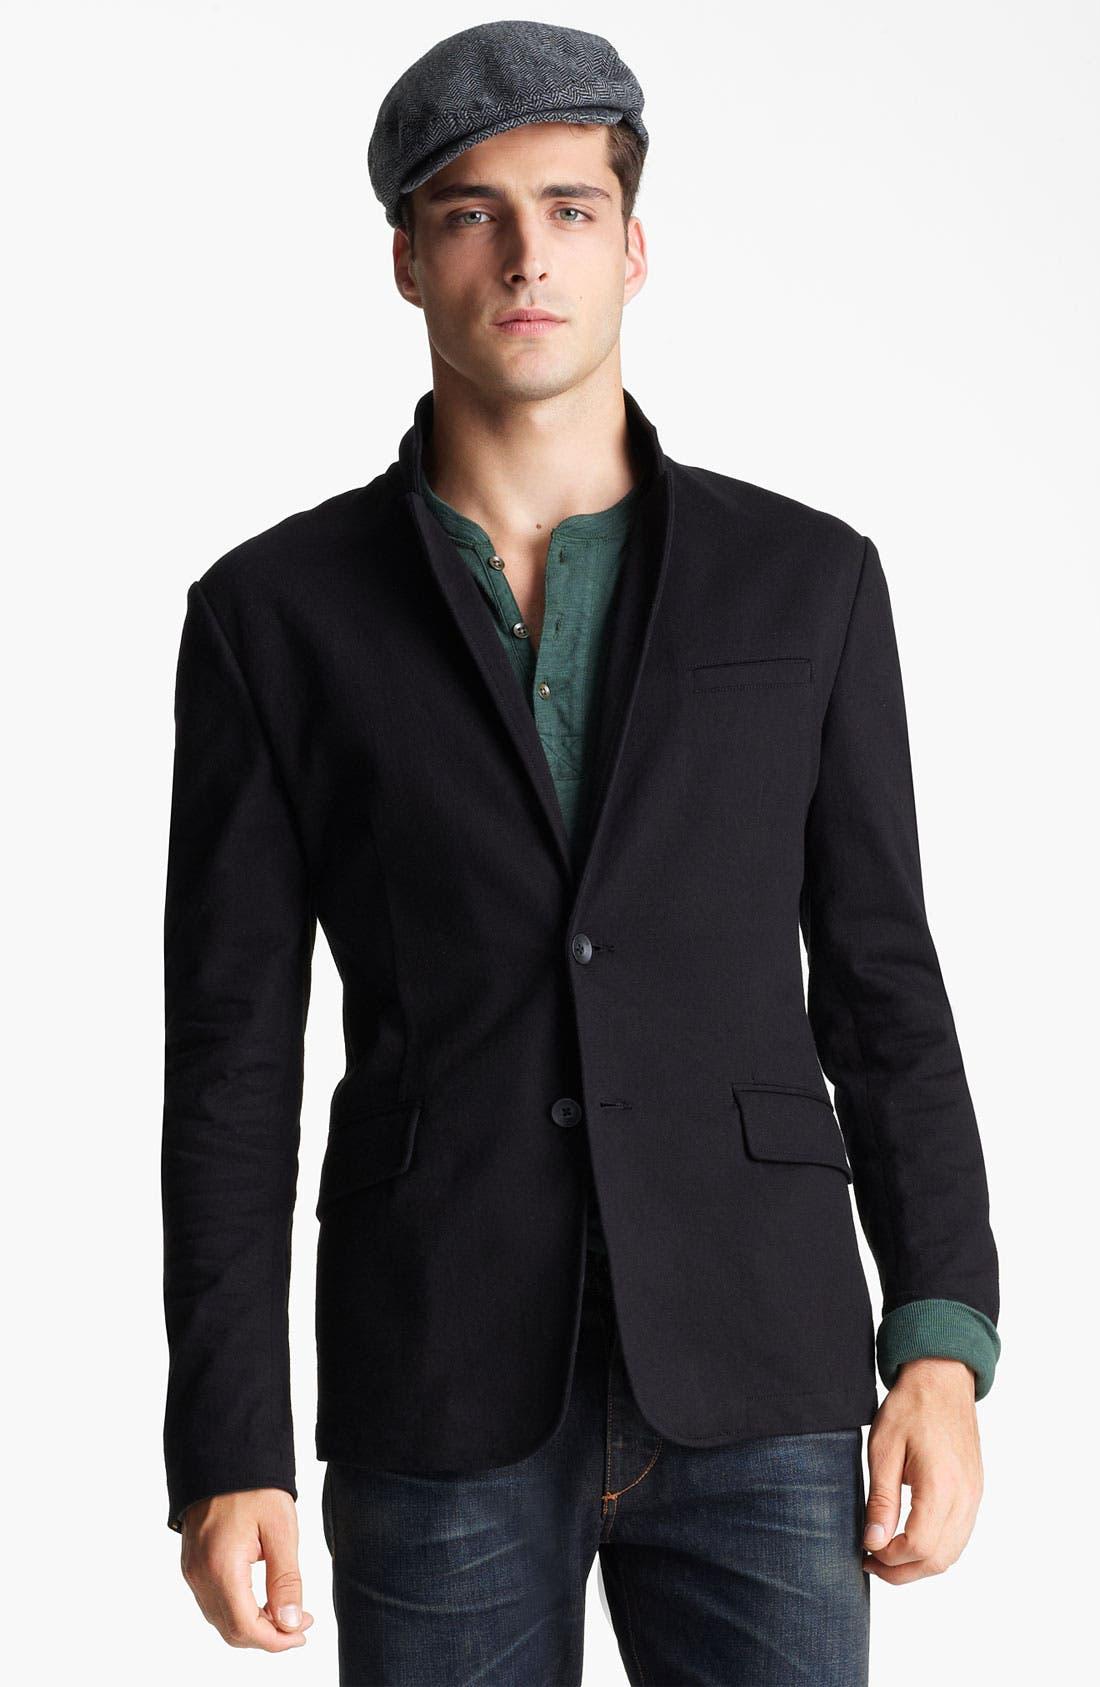 Alternate Image 1 Selected - rag & bone 'Phillips' Cotton Blazer